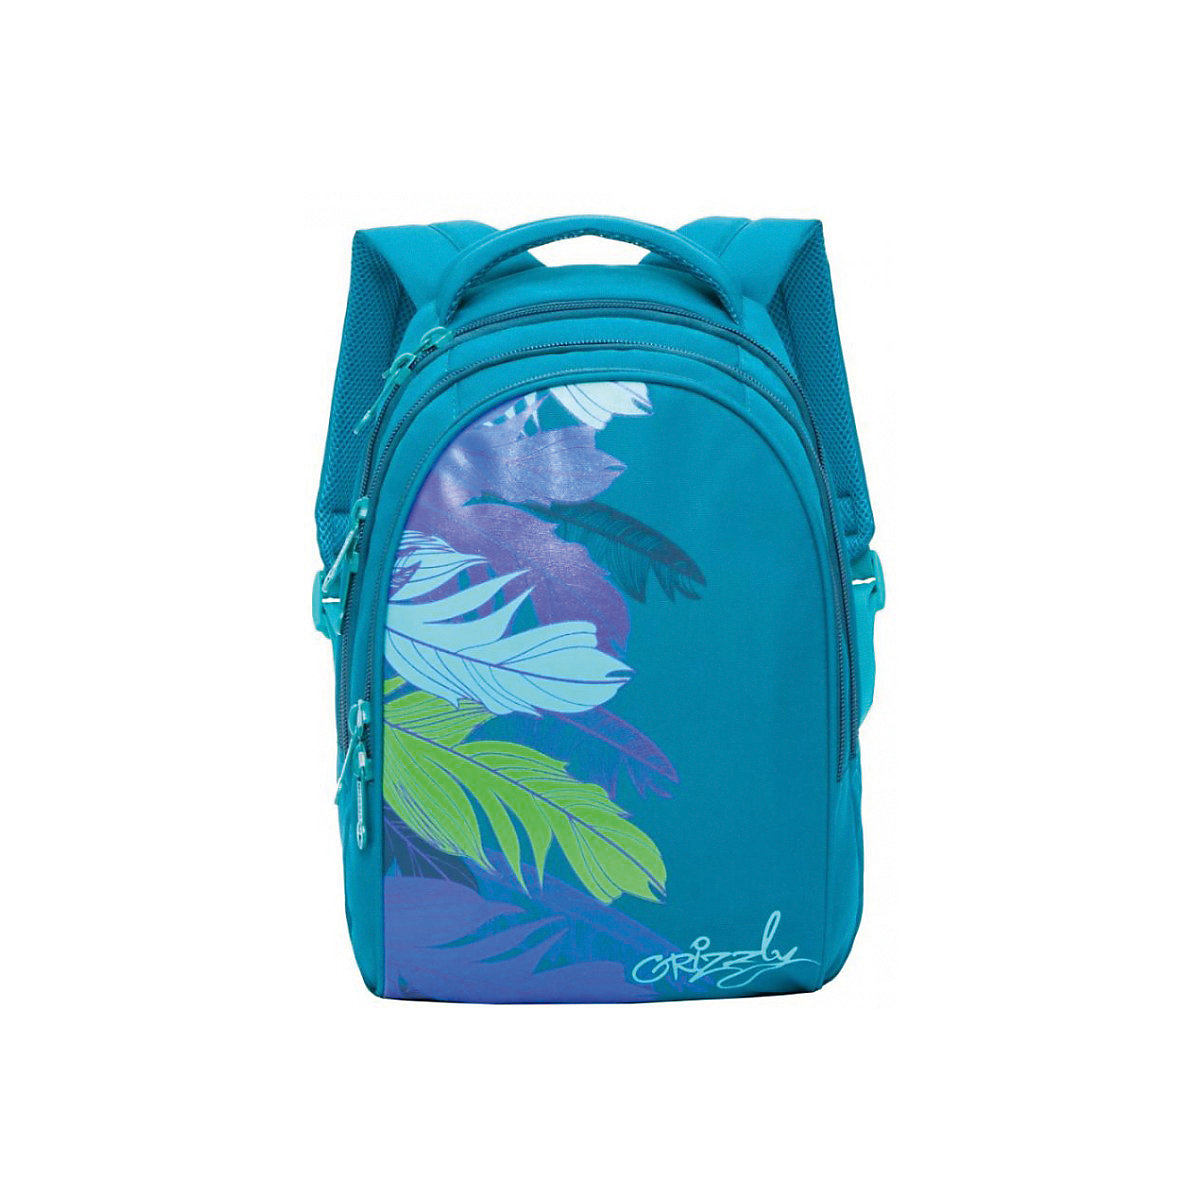 School Bags GRIZZLY 8333942 schoolbag backpack orthopedic bag for boy and girl animals flowers men original leather fashion travel university college school book bag designer male backpack daypack student laptop bag 9950